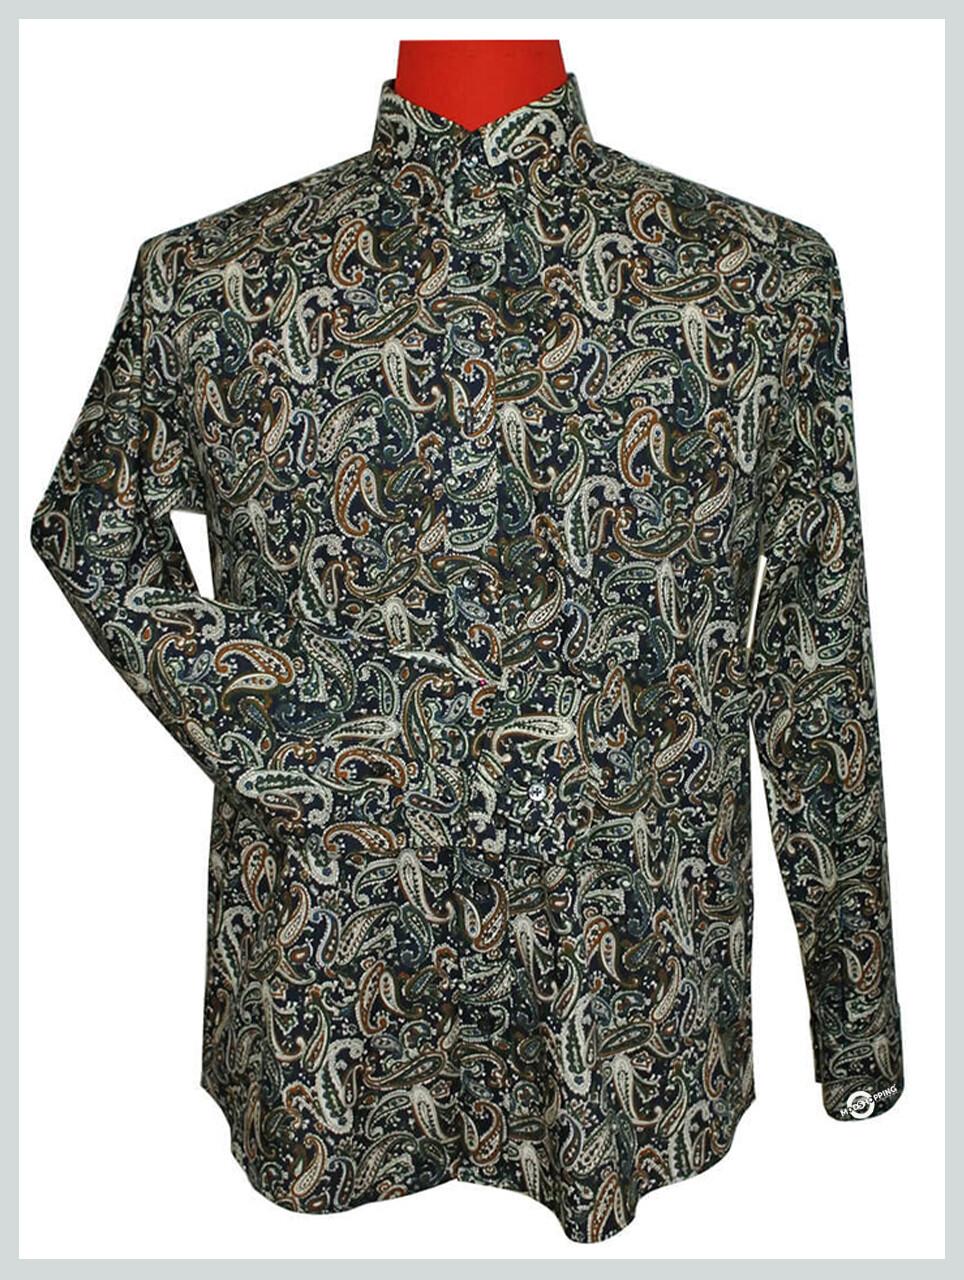 Paisley Shirt | 60s Mod Style Casual Shirt